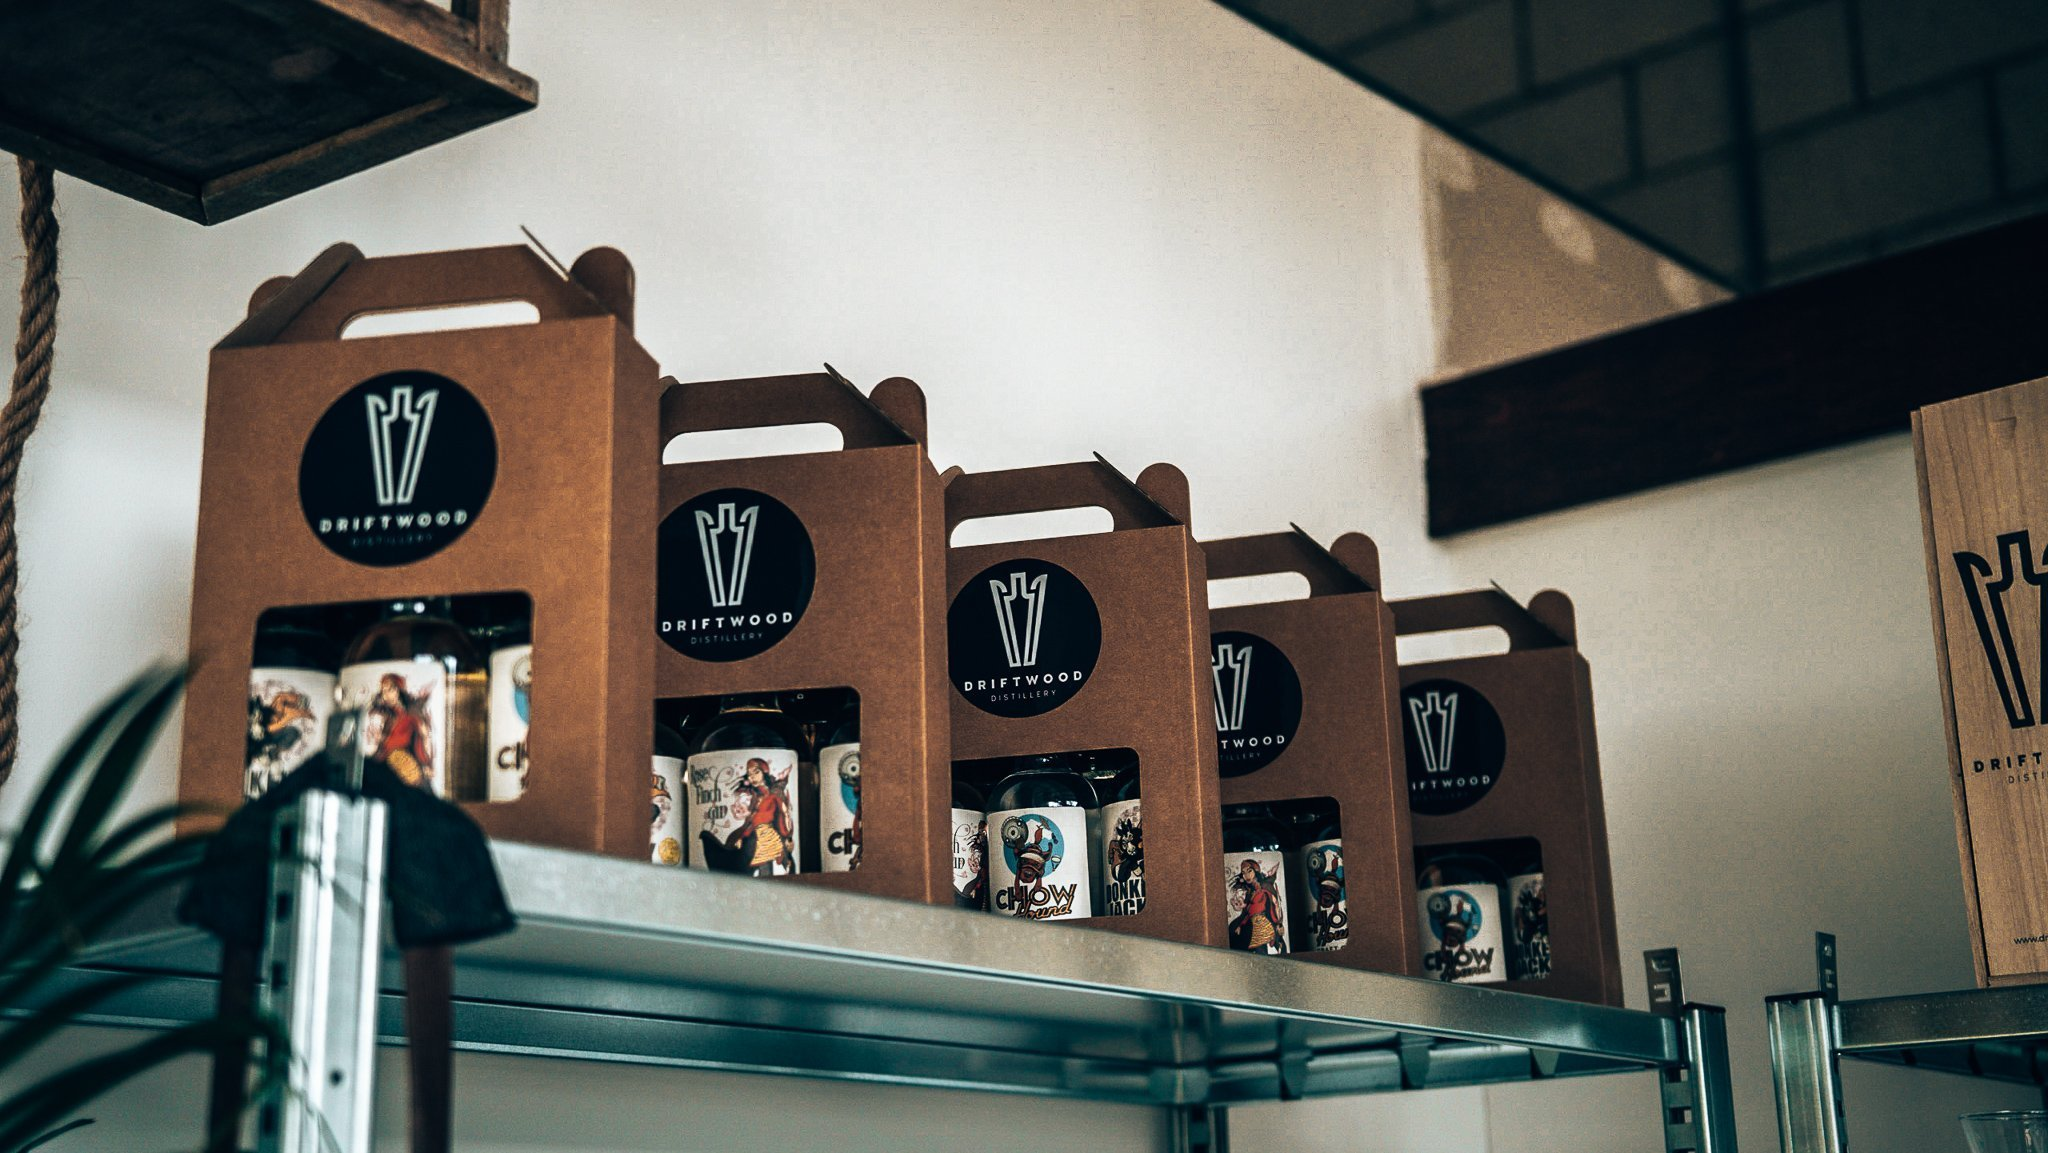 Geschenkverpakkingen Driftwood Distillery Gin, Vliegveld Valkenburg, Alles over gin.